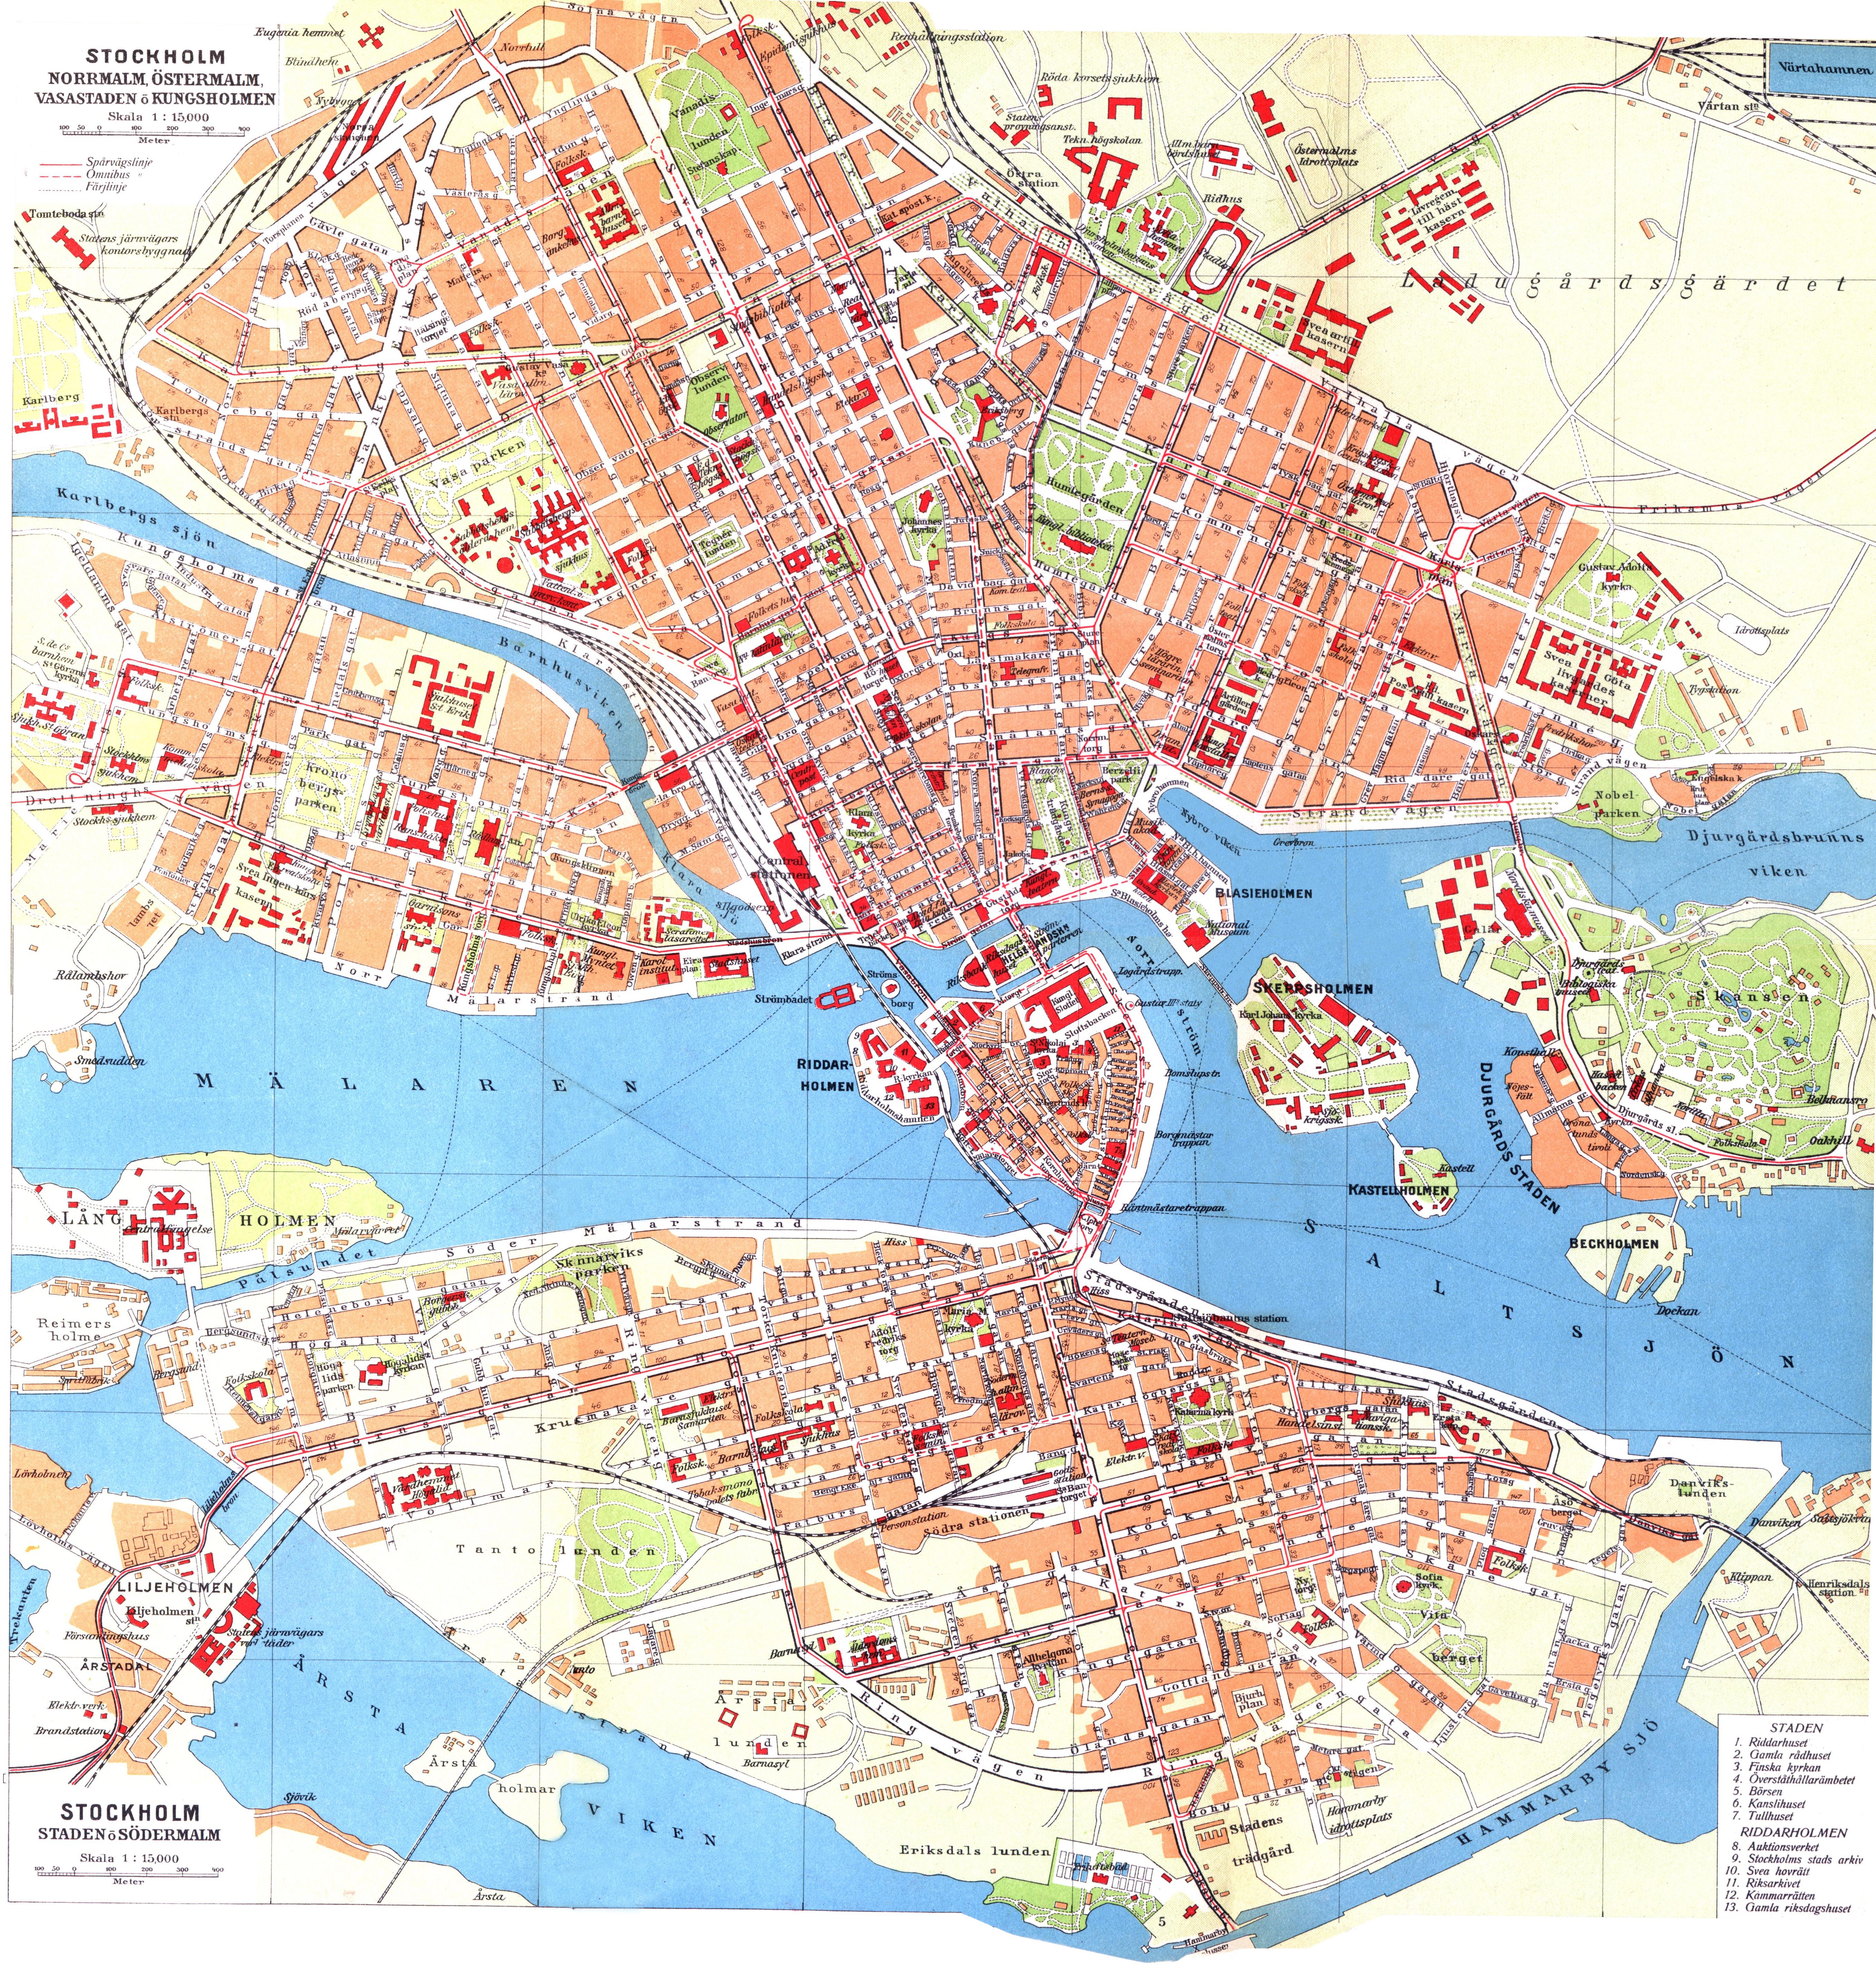 stockholm city karta File:Cohrs atlas över Sverige Stockholm map.   Wikimedia Commons stockholm city karta